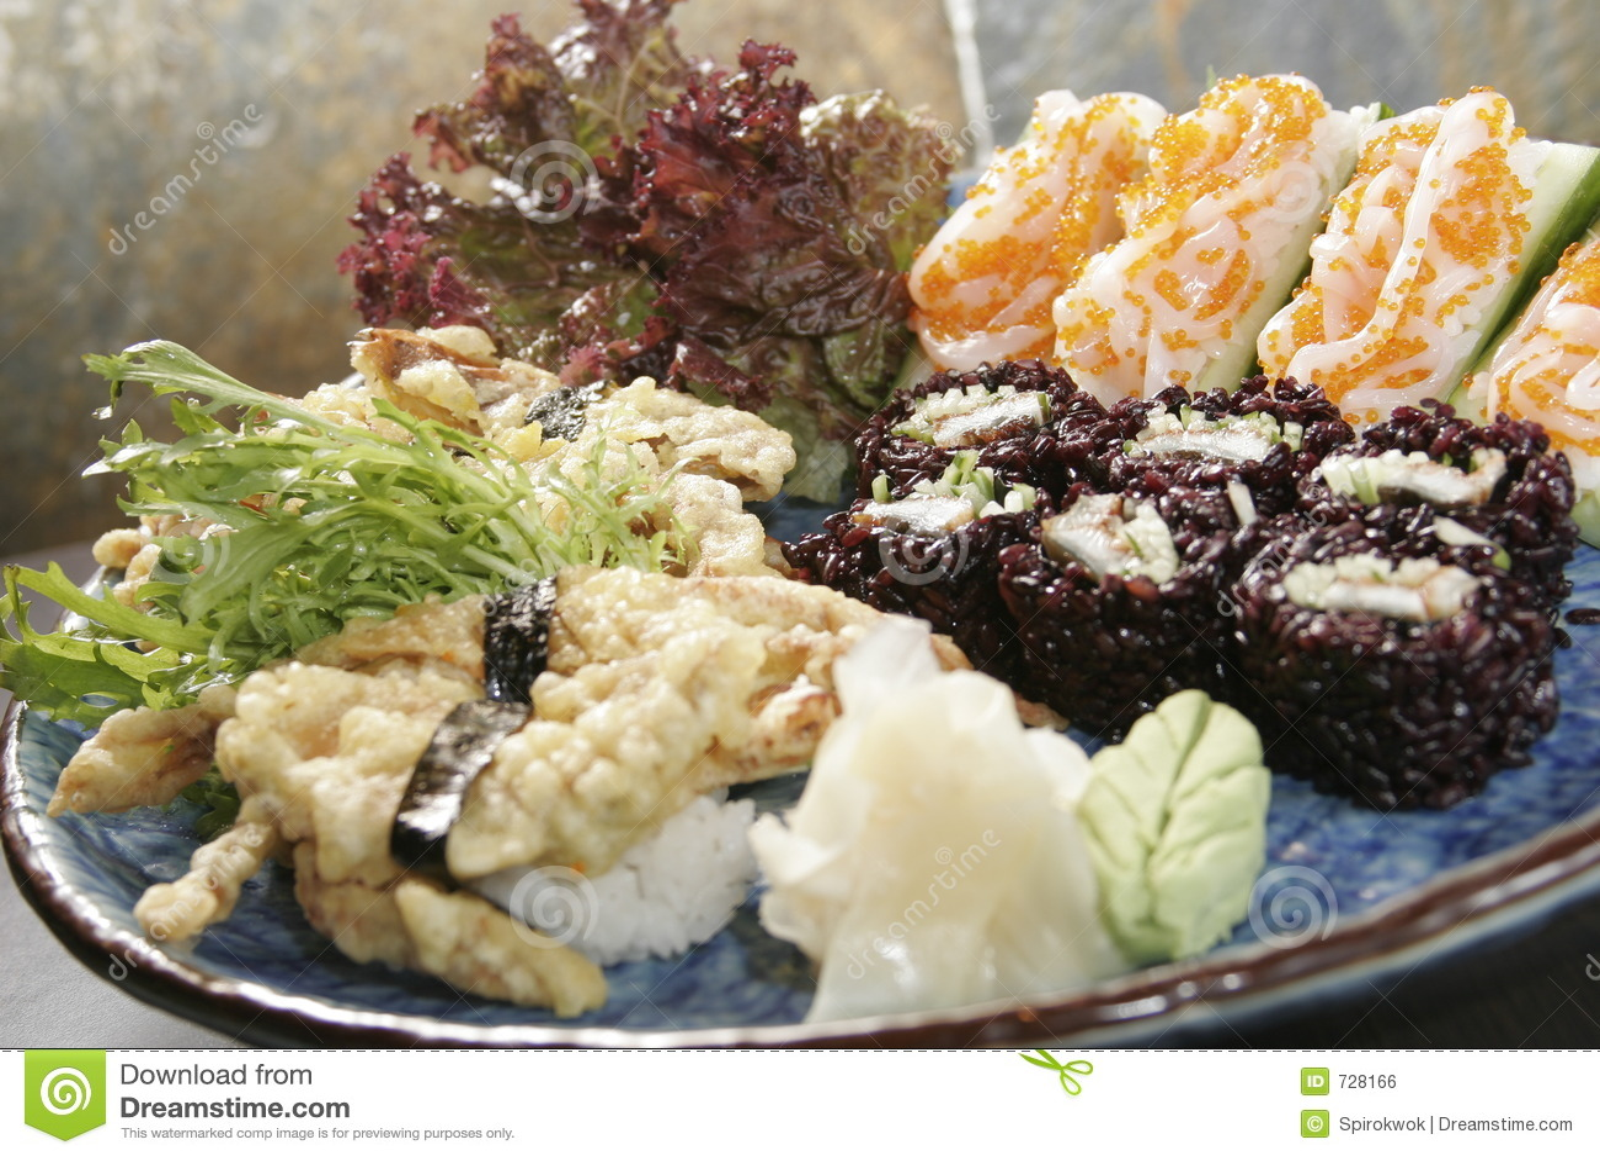 Japaness food_001